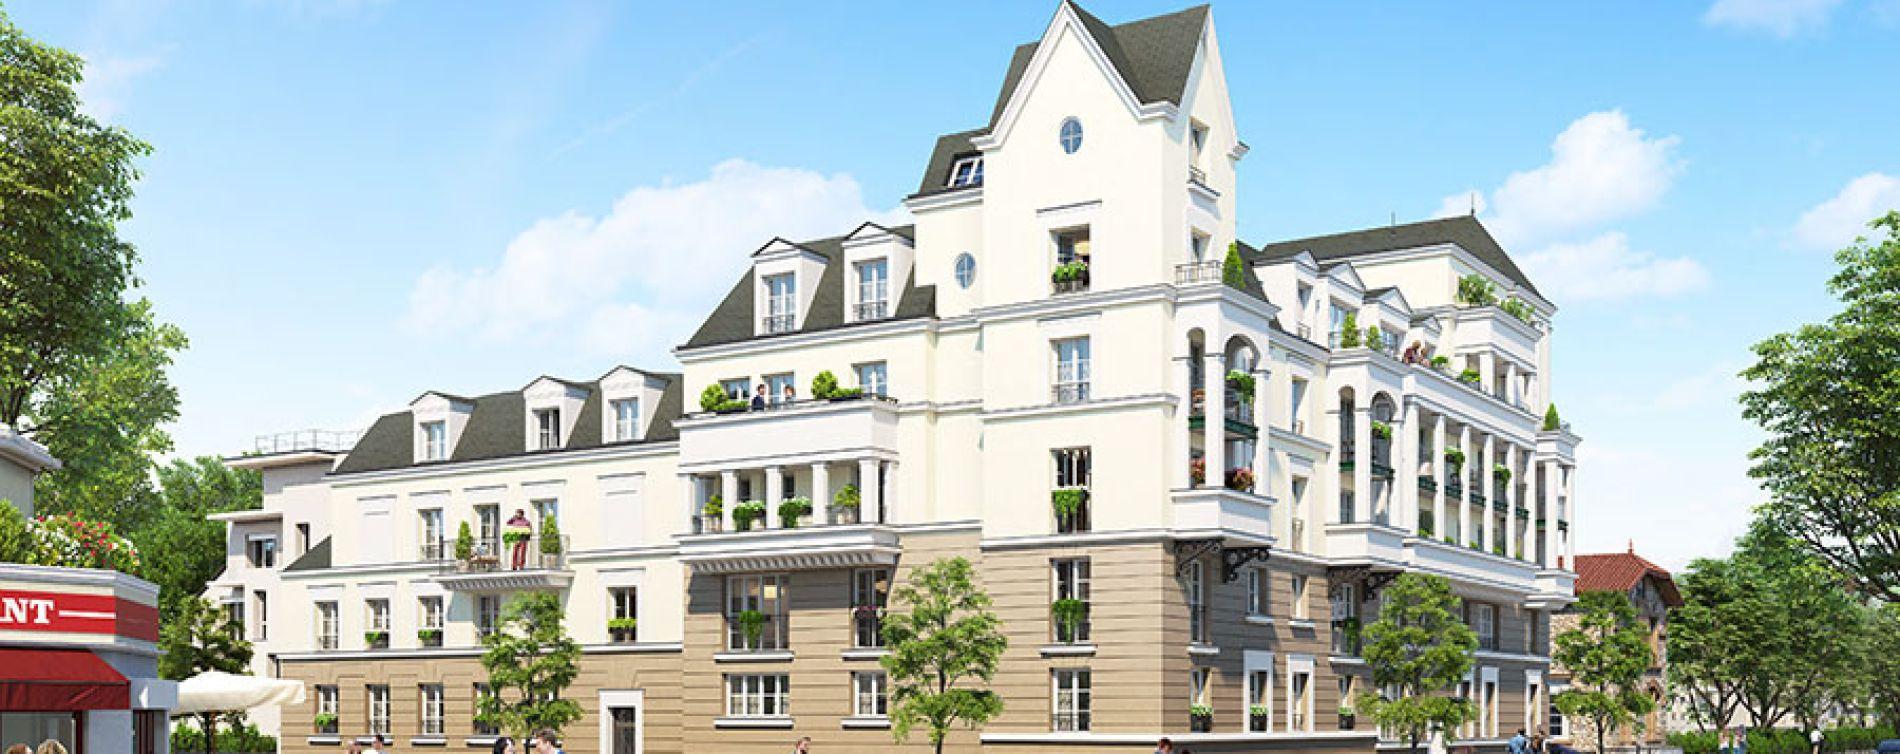 Résidence Villa des Frênes au Blanc-Mesnil